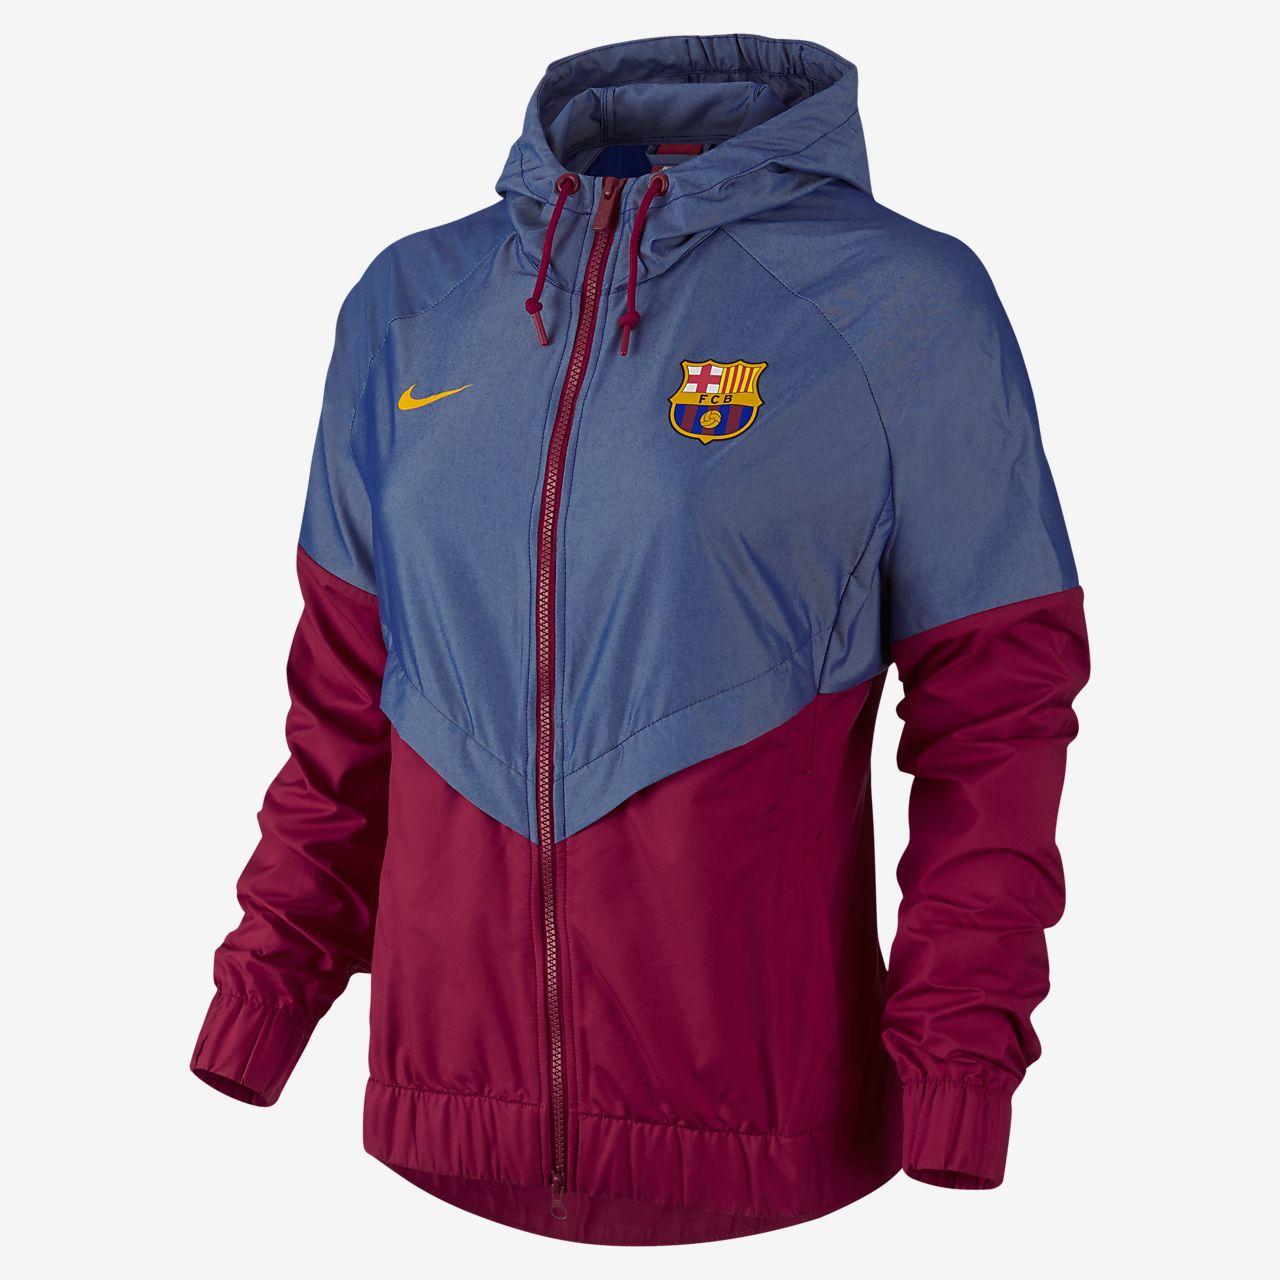 dd08816d9 FC Barcelona Authentic Windrunner Women s Jacket. Nike.com BE